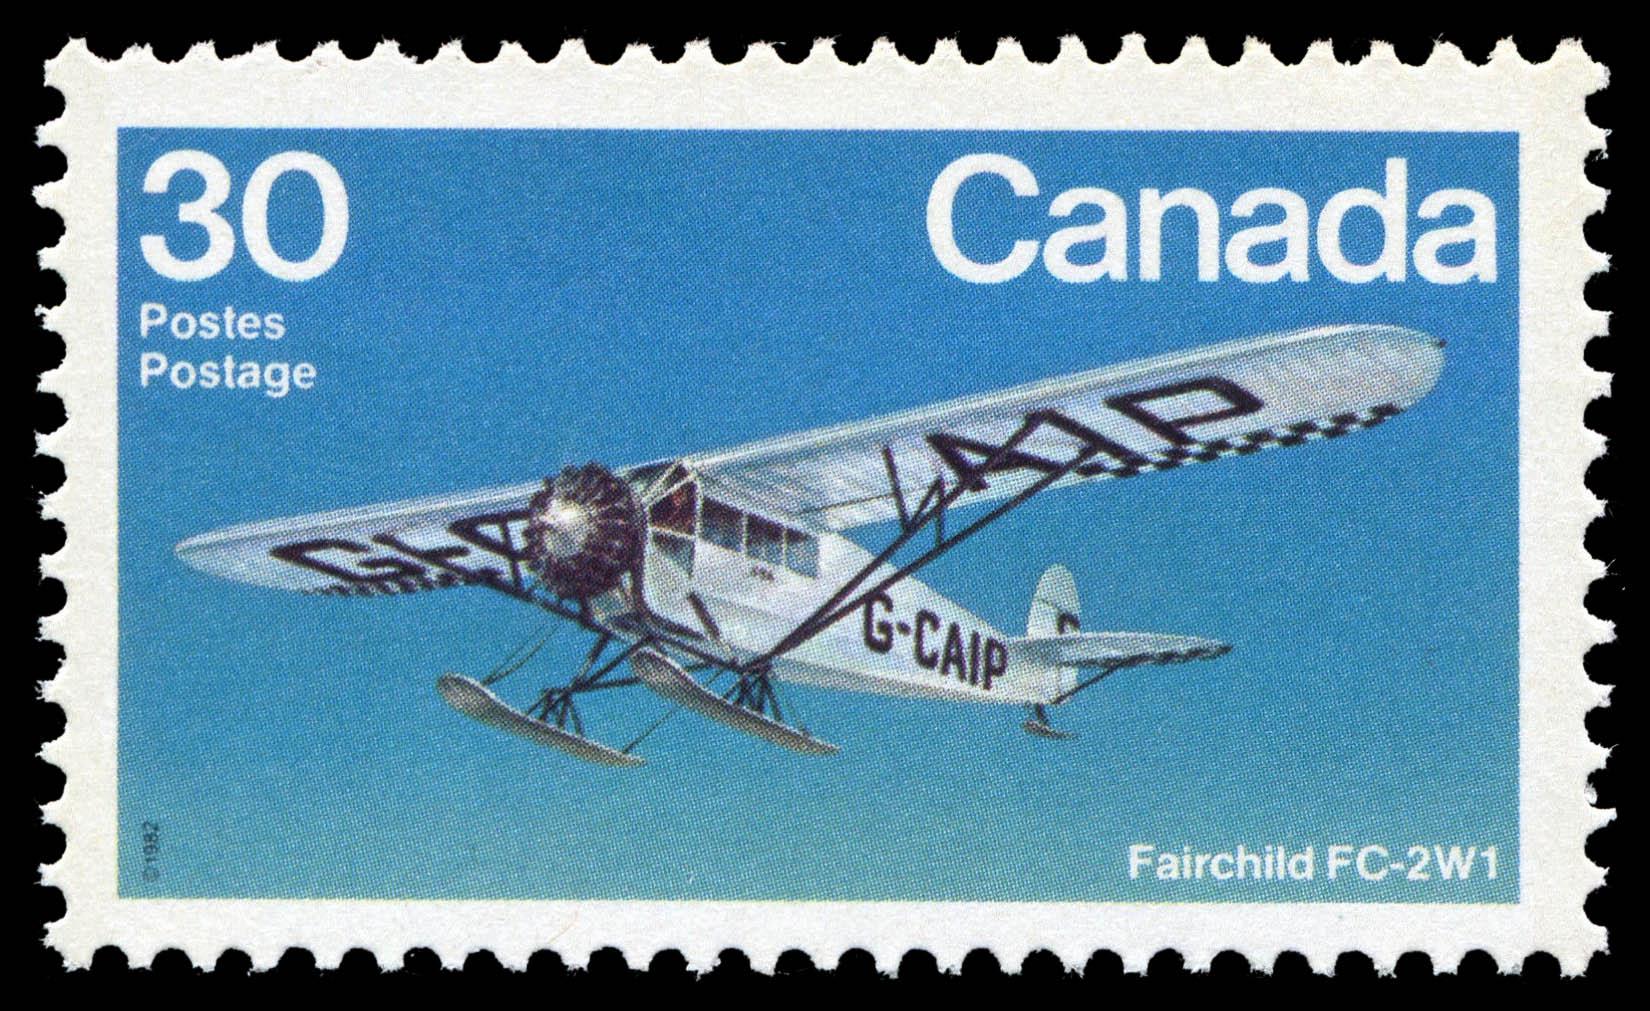 Fairchild FC-2W1 Canada Postage Stamp | Canadian Aircraft, Bush Aircraft